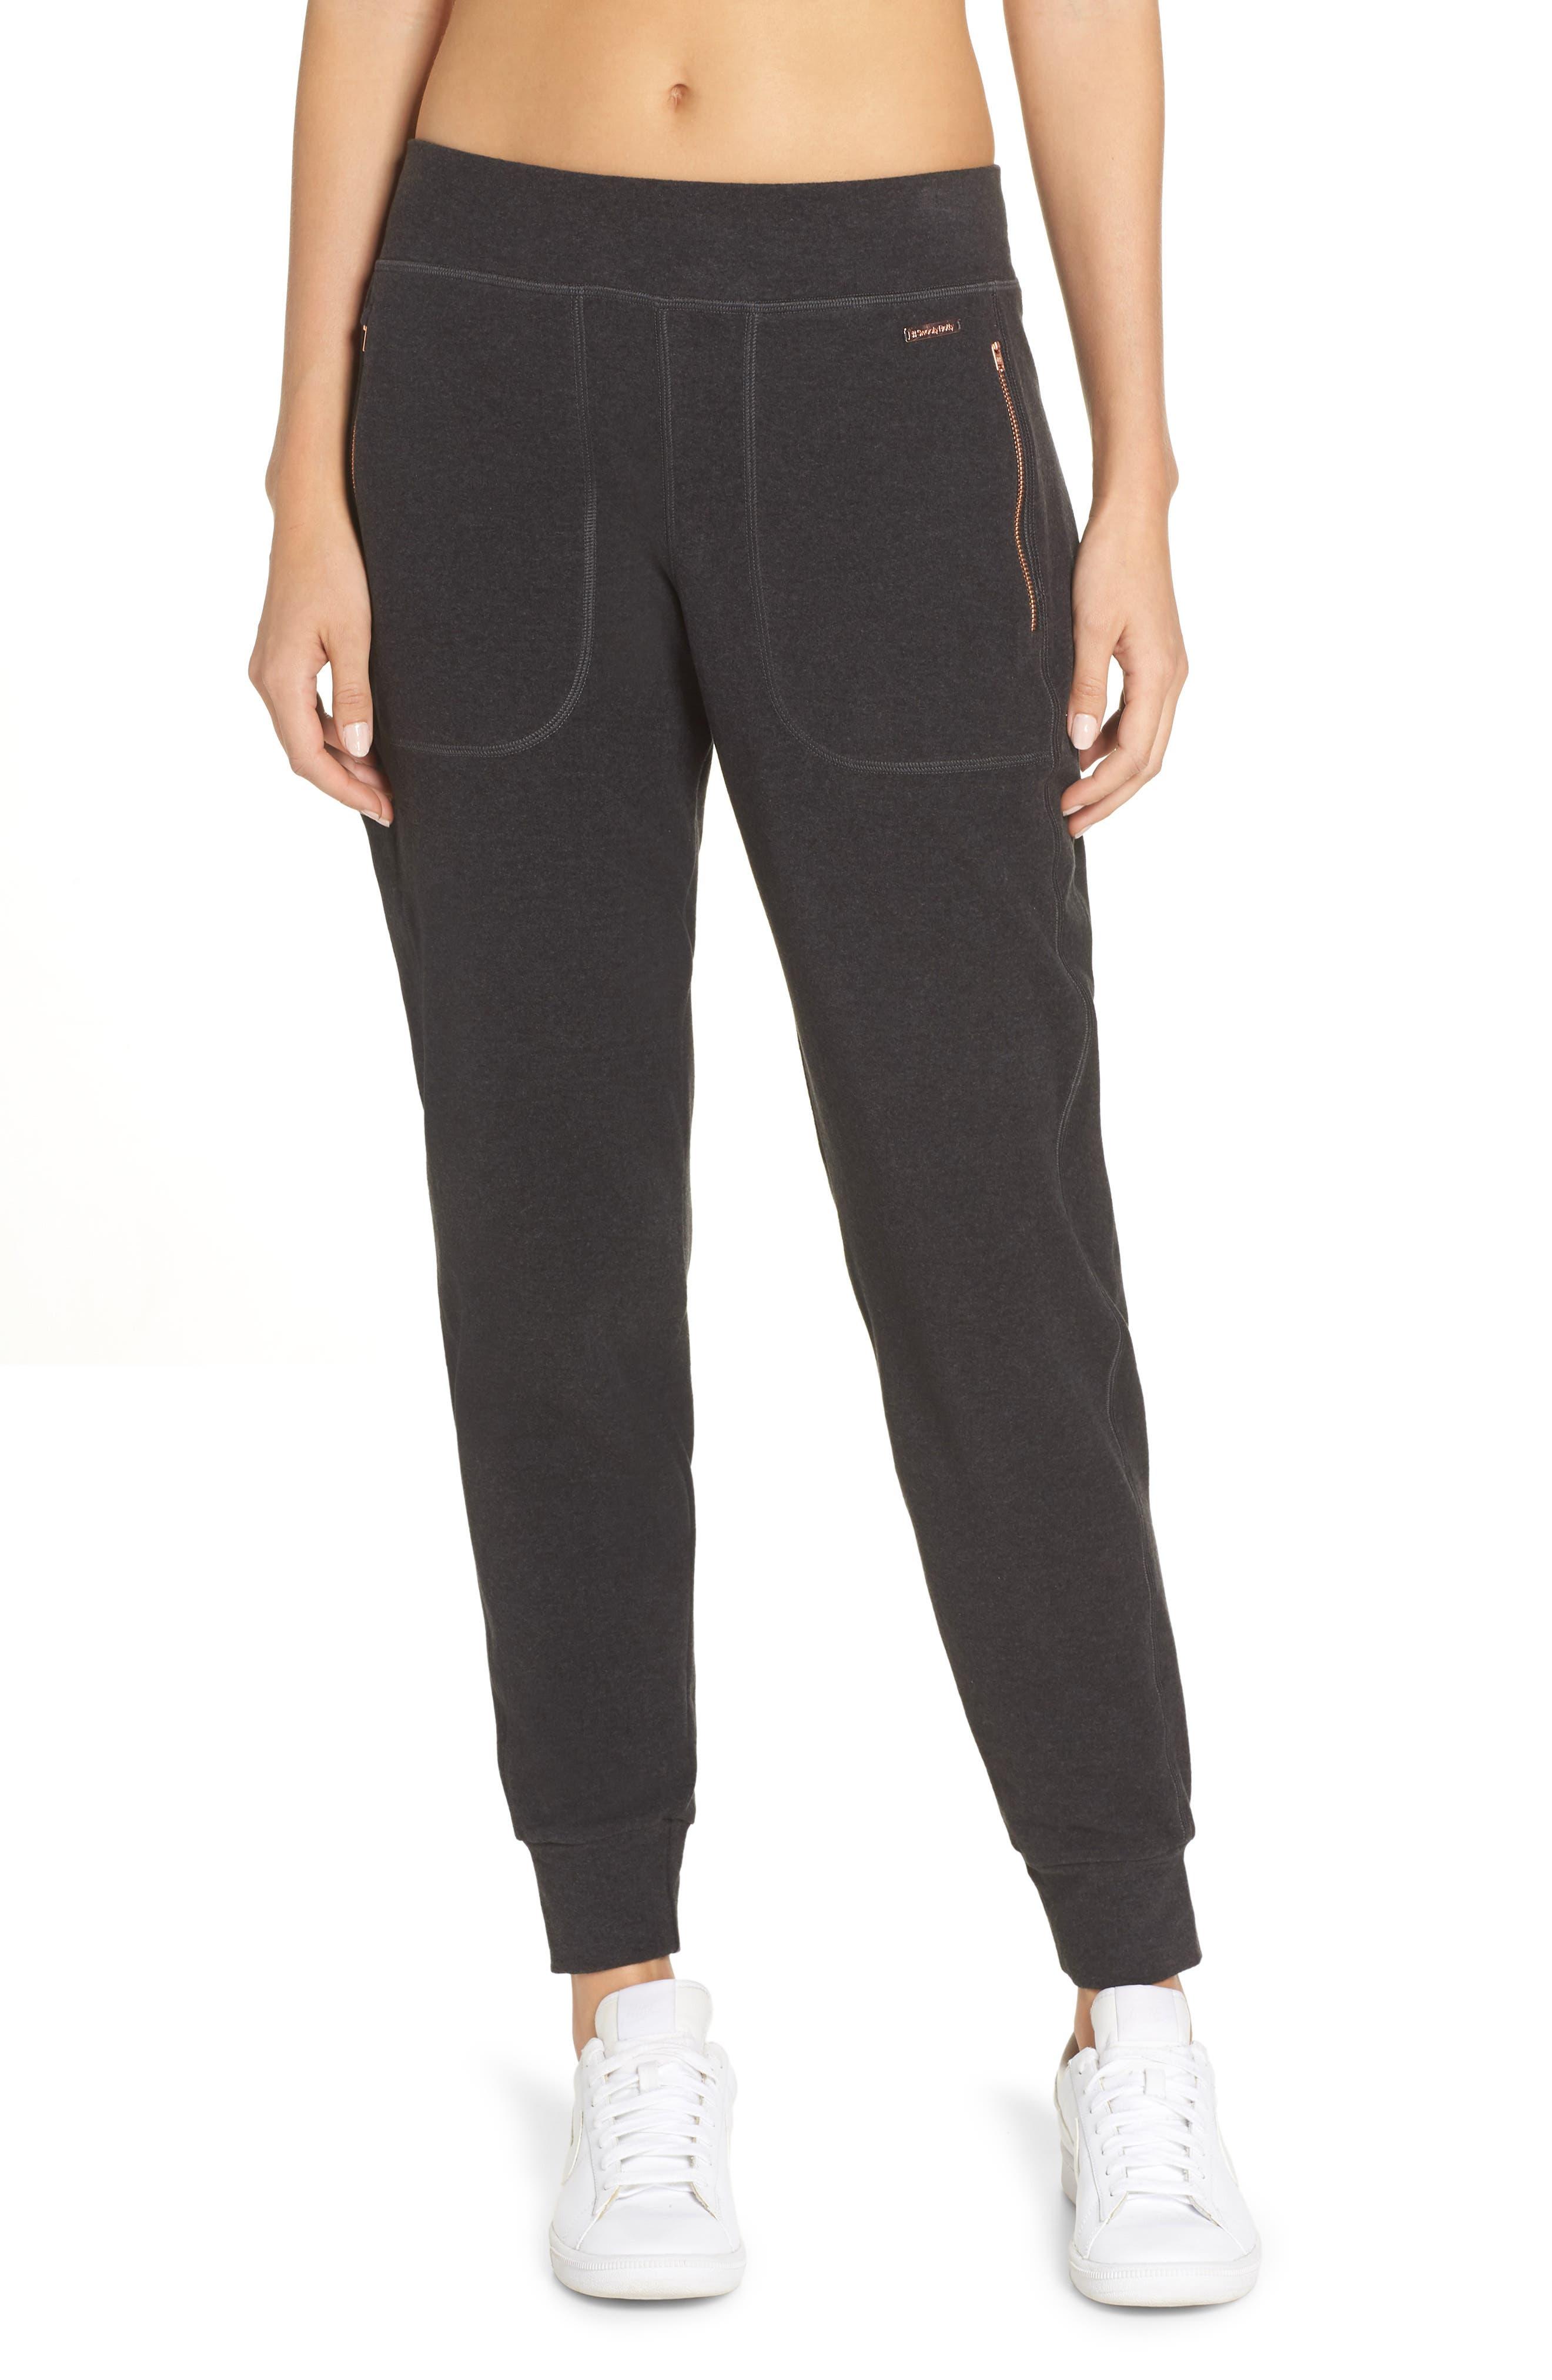 Luxe Liberty Jogger Pants,                             Main thumbnail 1, color,                             BLACK MARL